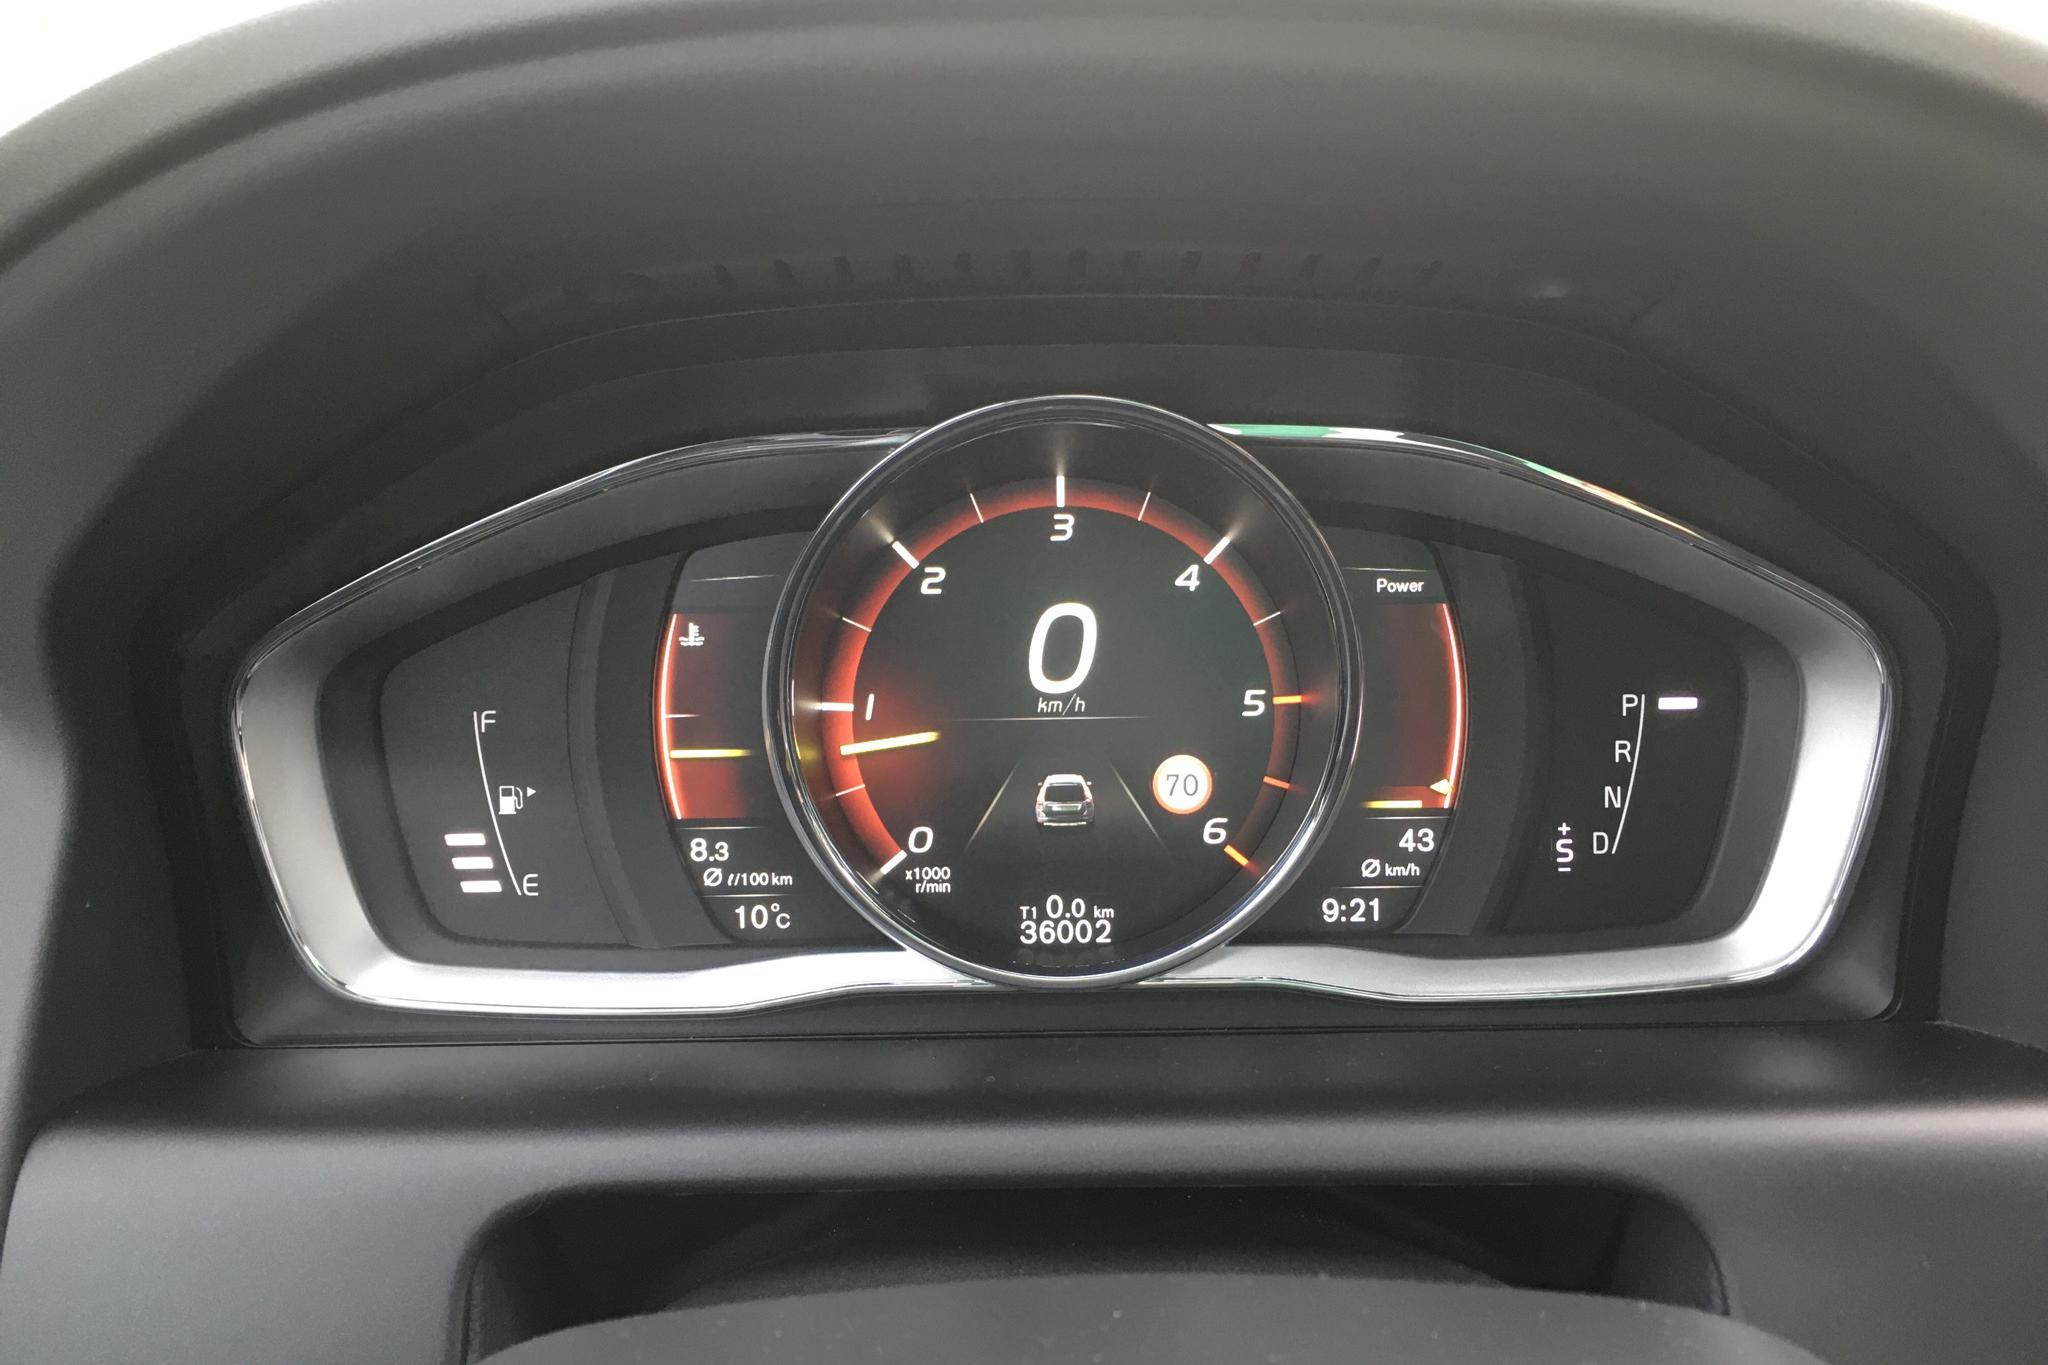 Volvo XC60 D4 AWD (190hk) - 36 000 km - Automatic - silver - 2017